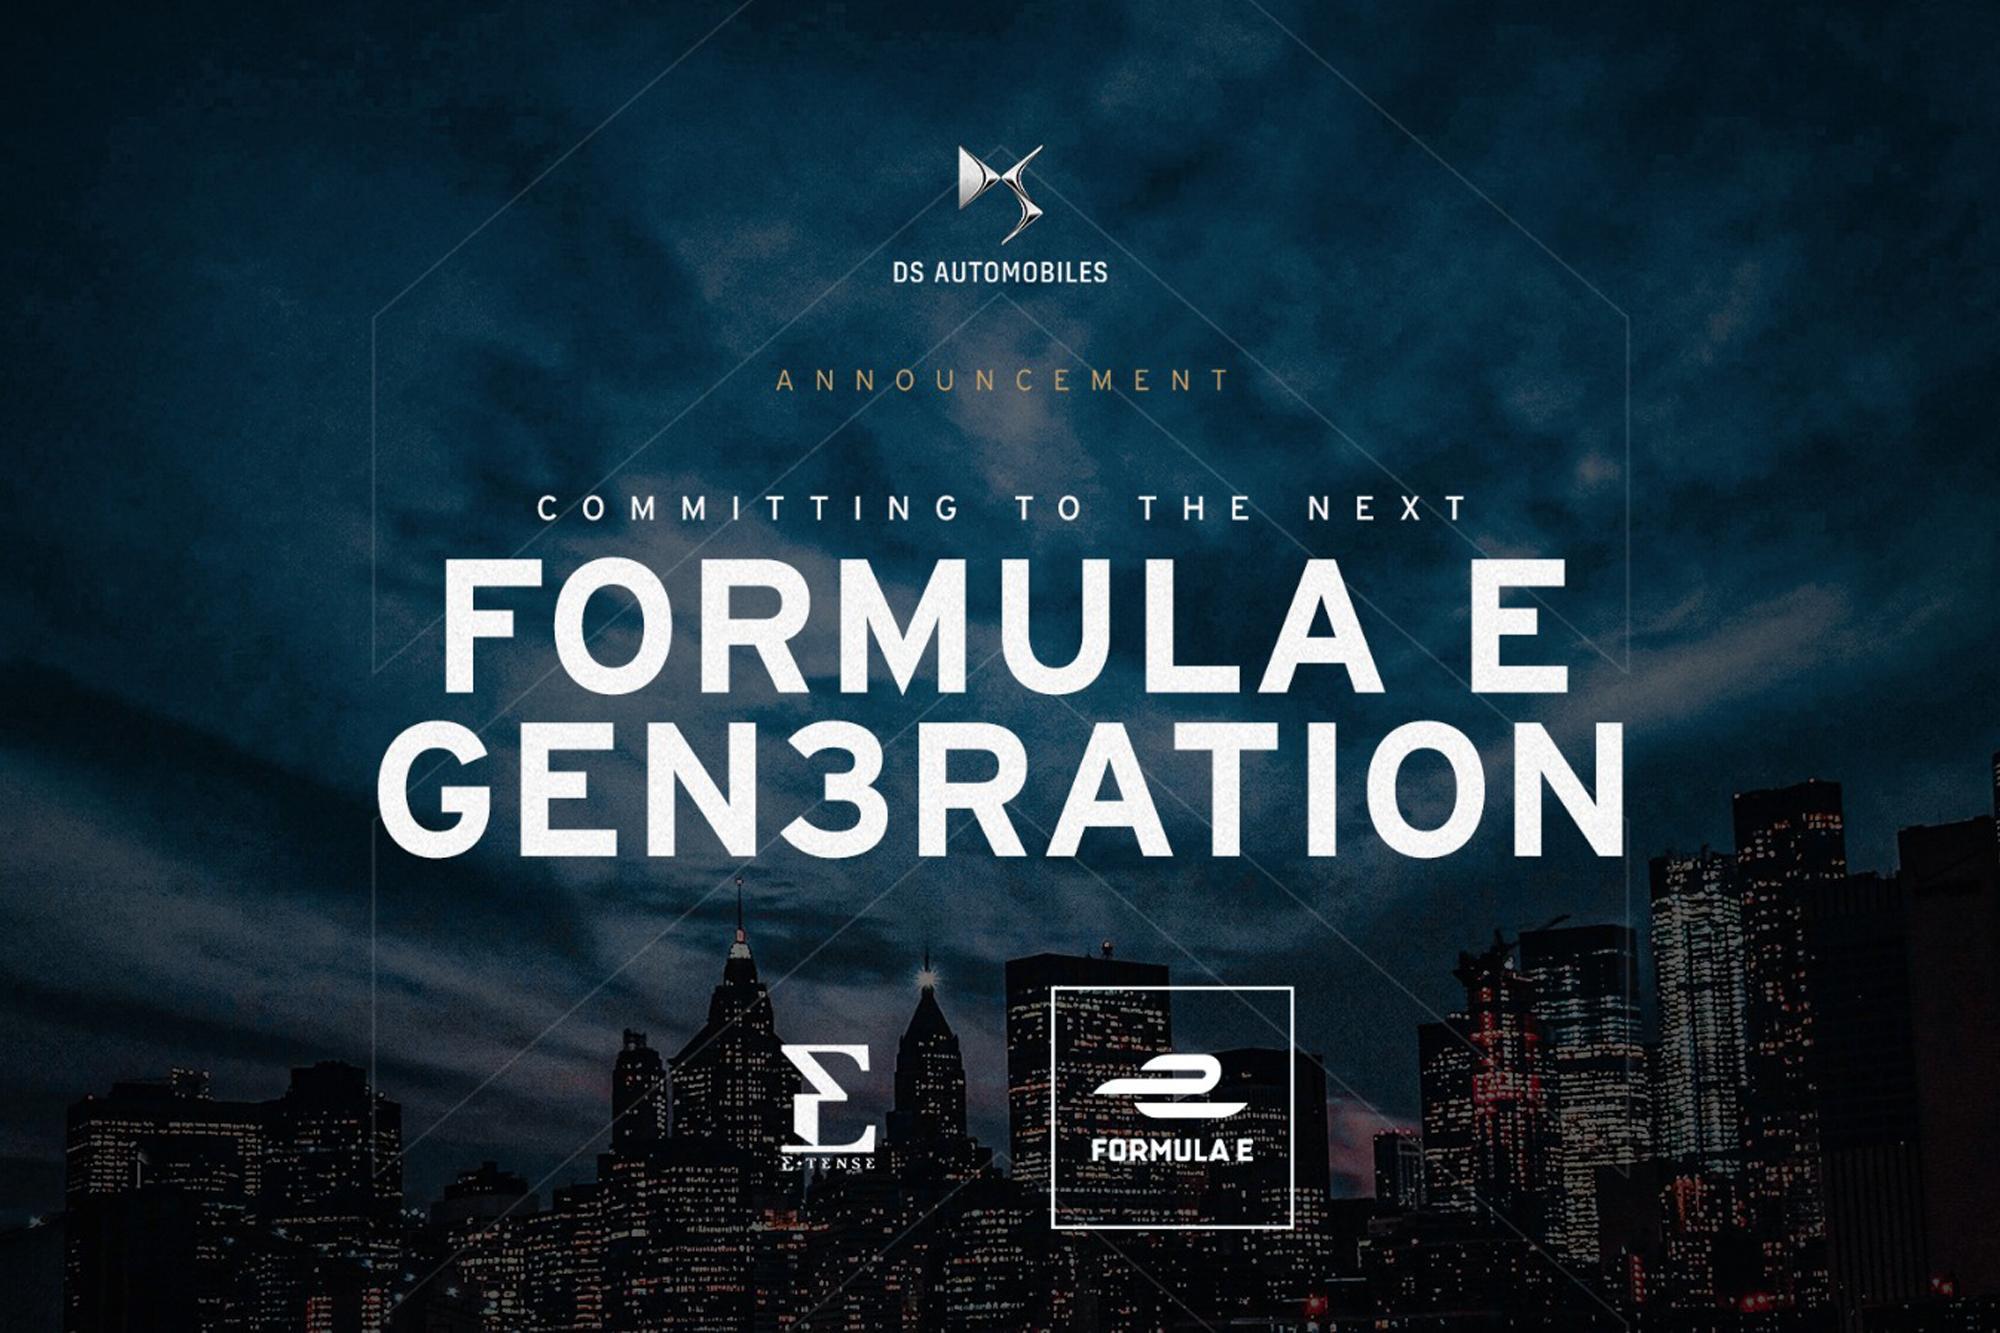 H DS Automobiles θα παραμείνει στην Formula E